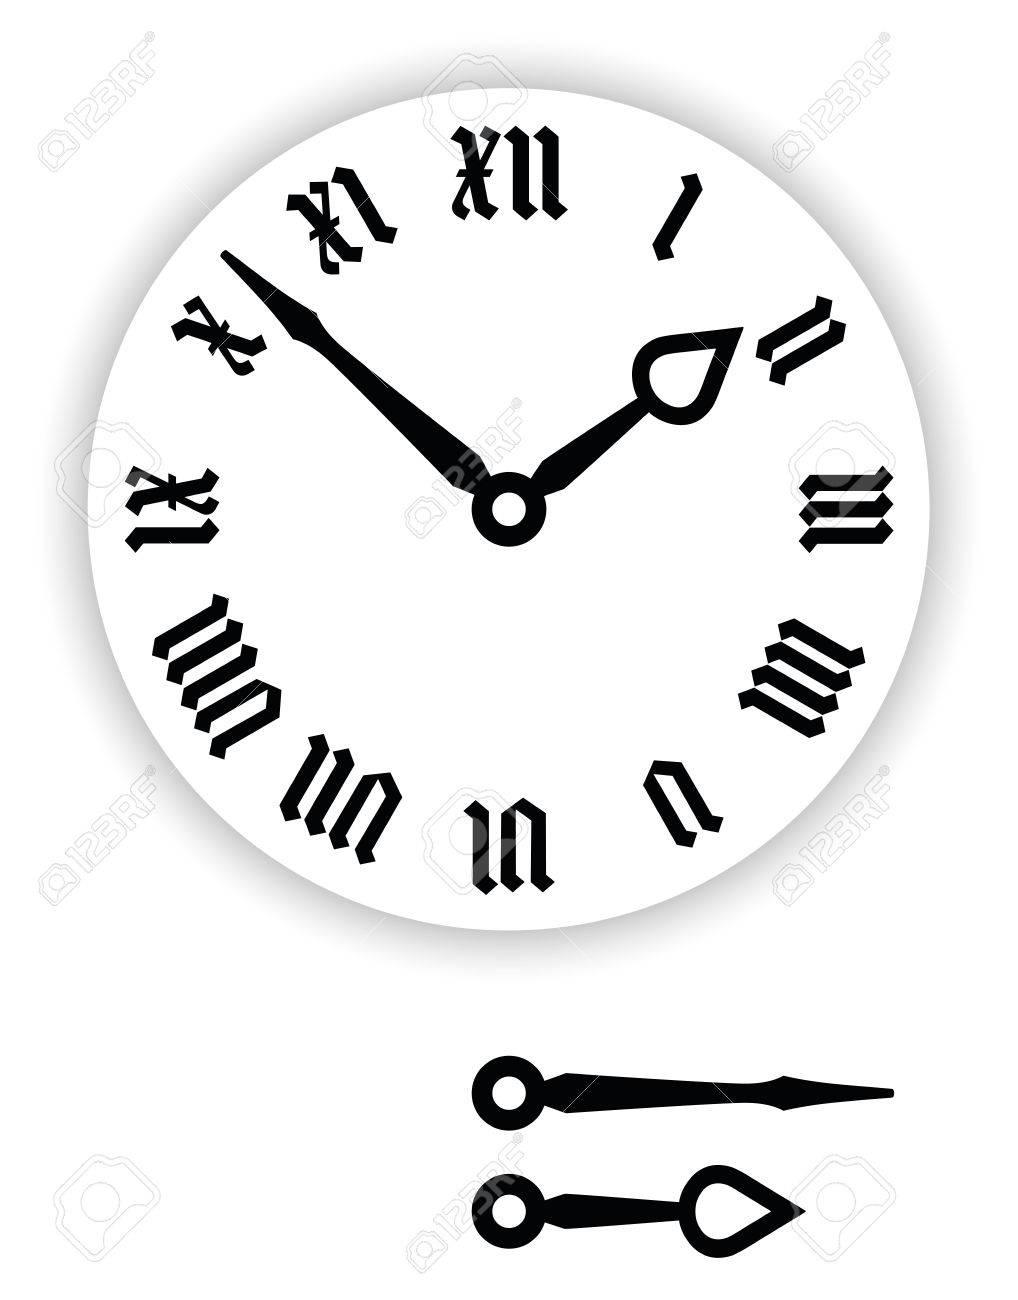 Fraktur Roman numerals clock face  Part of analog clock with